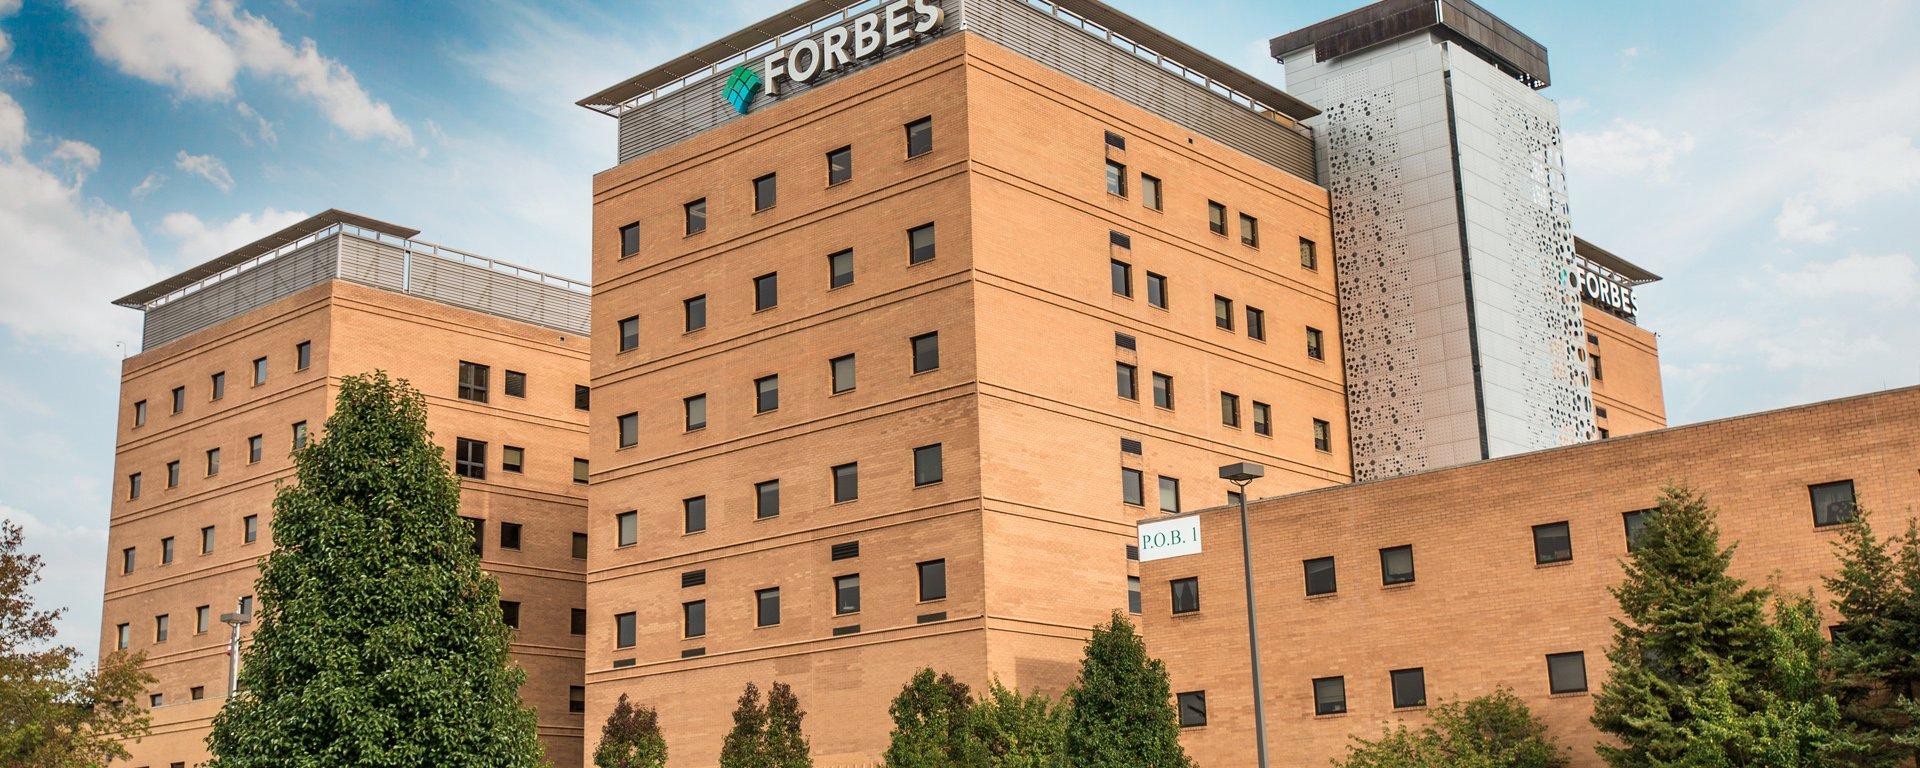 Forbes Hospital Entrance